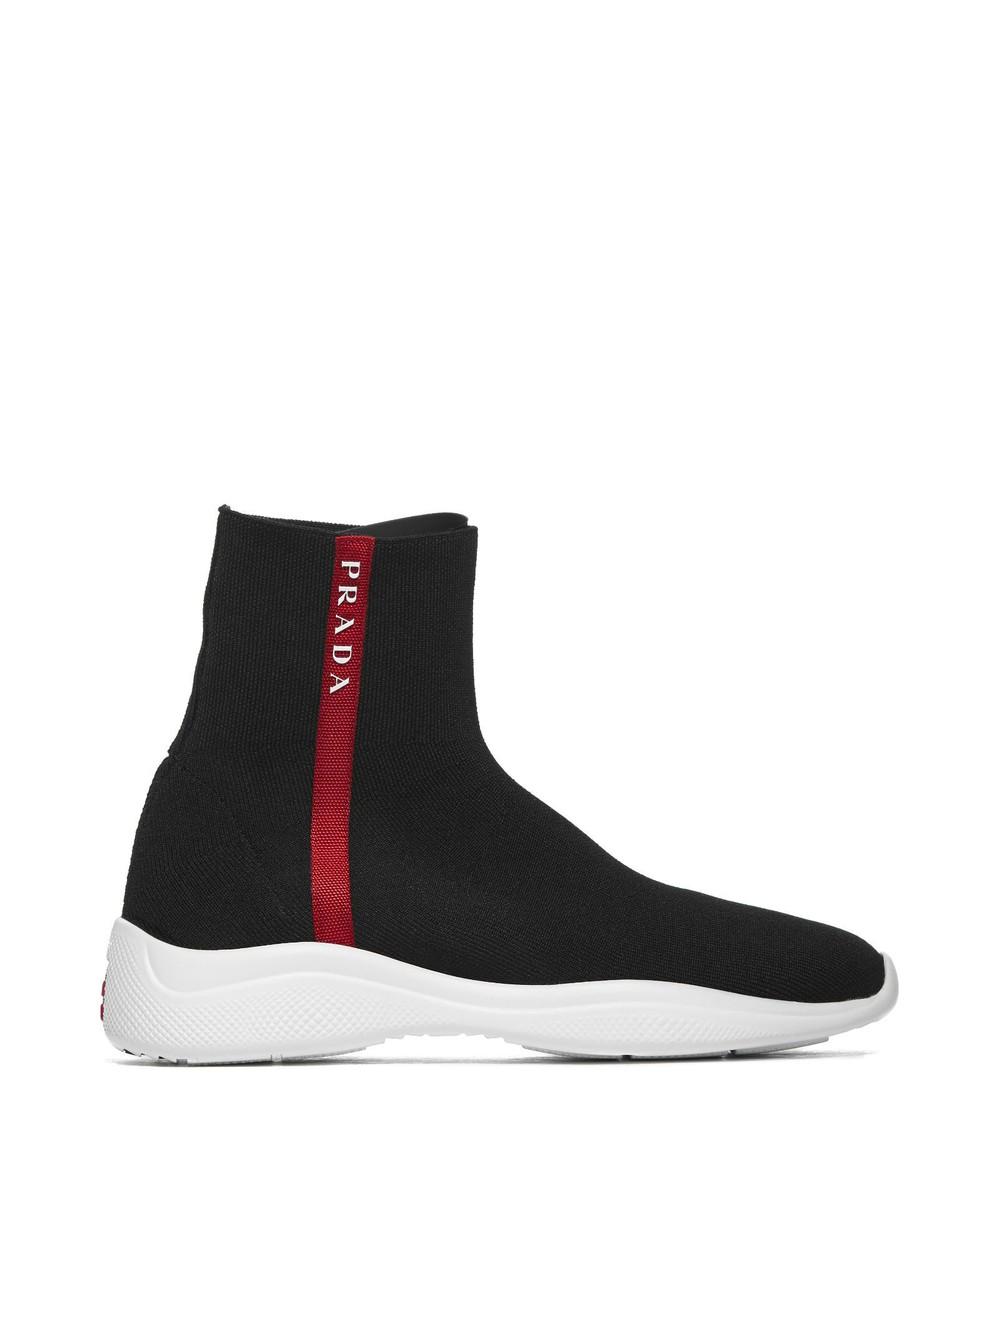 Prada Linea Rossa Logo Striped Hi-top Sneakers in nero